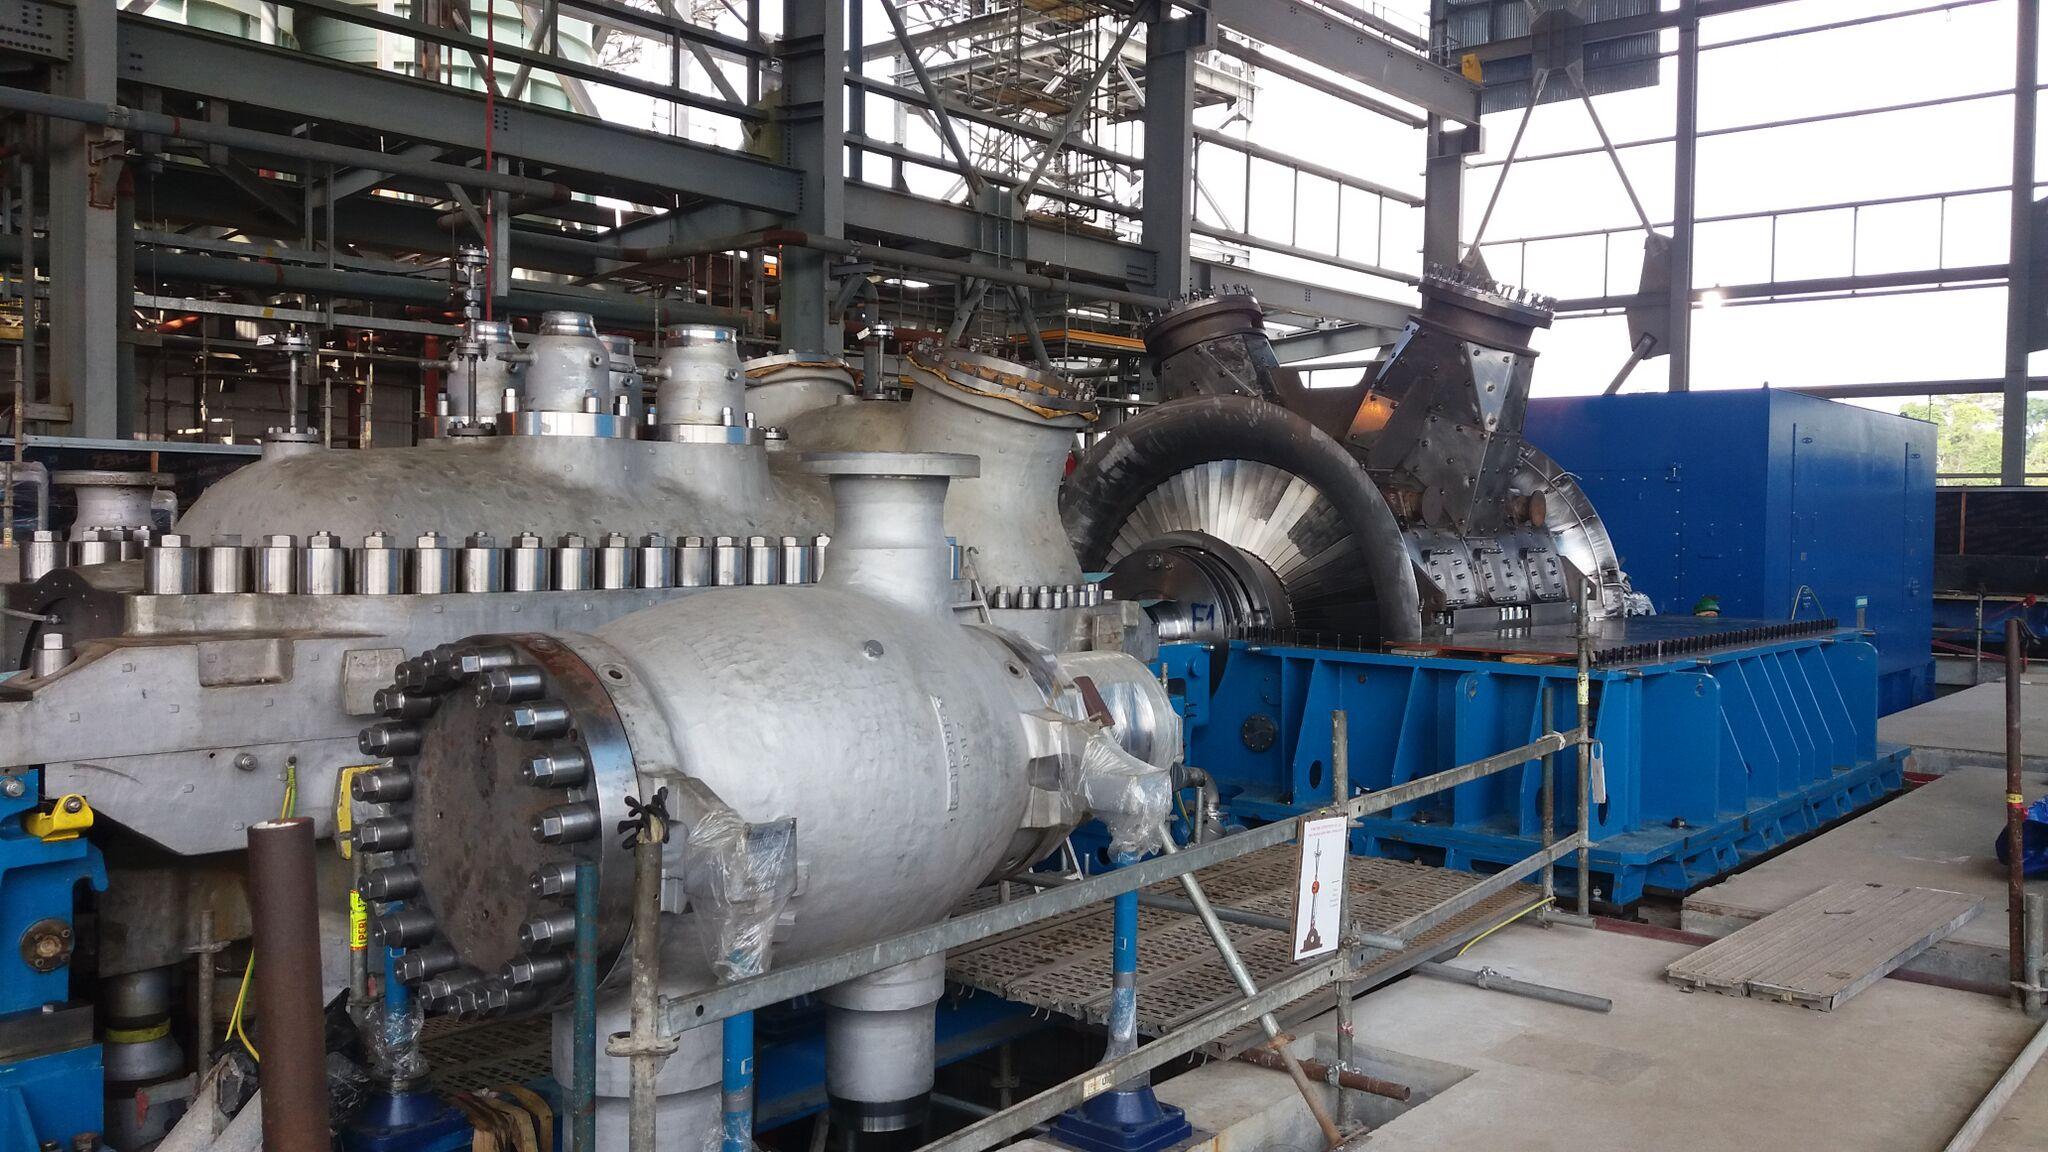 Assembly of new turbine generator seet